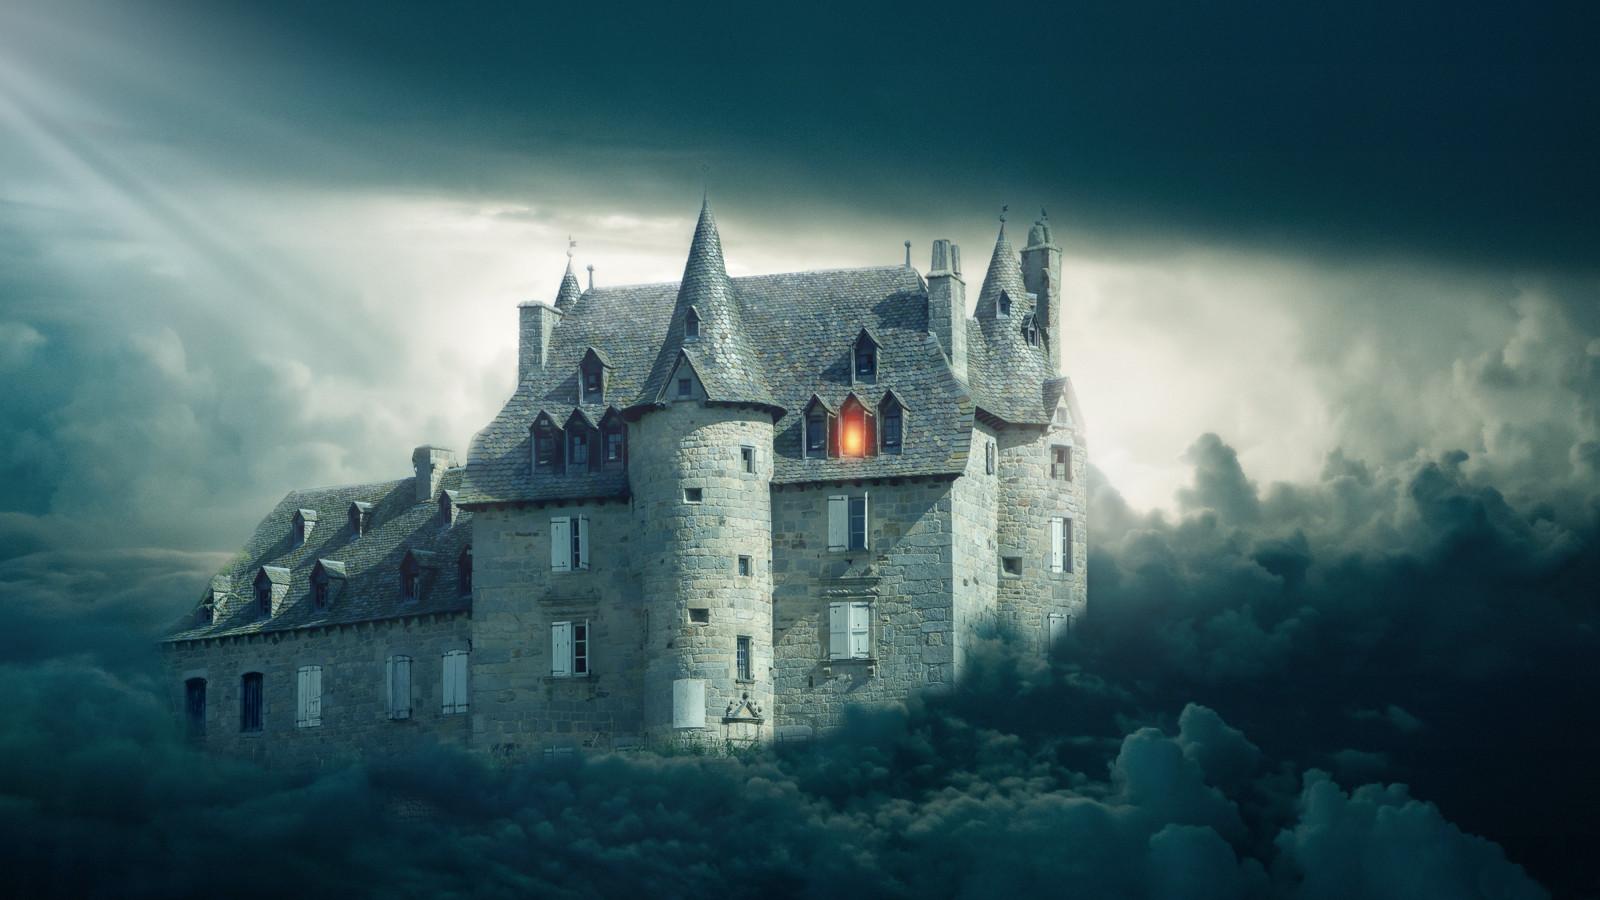 Download wallpaper: Gothic castle 1600x900